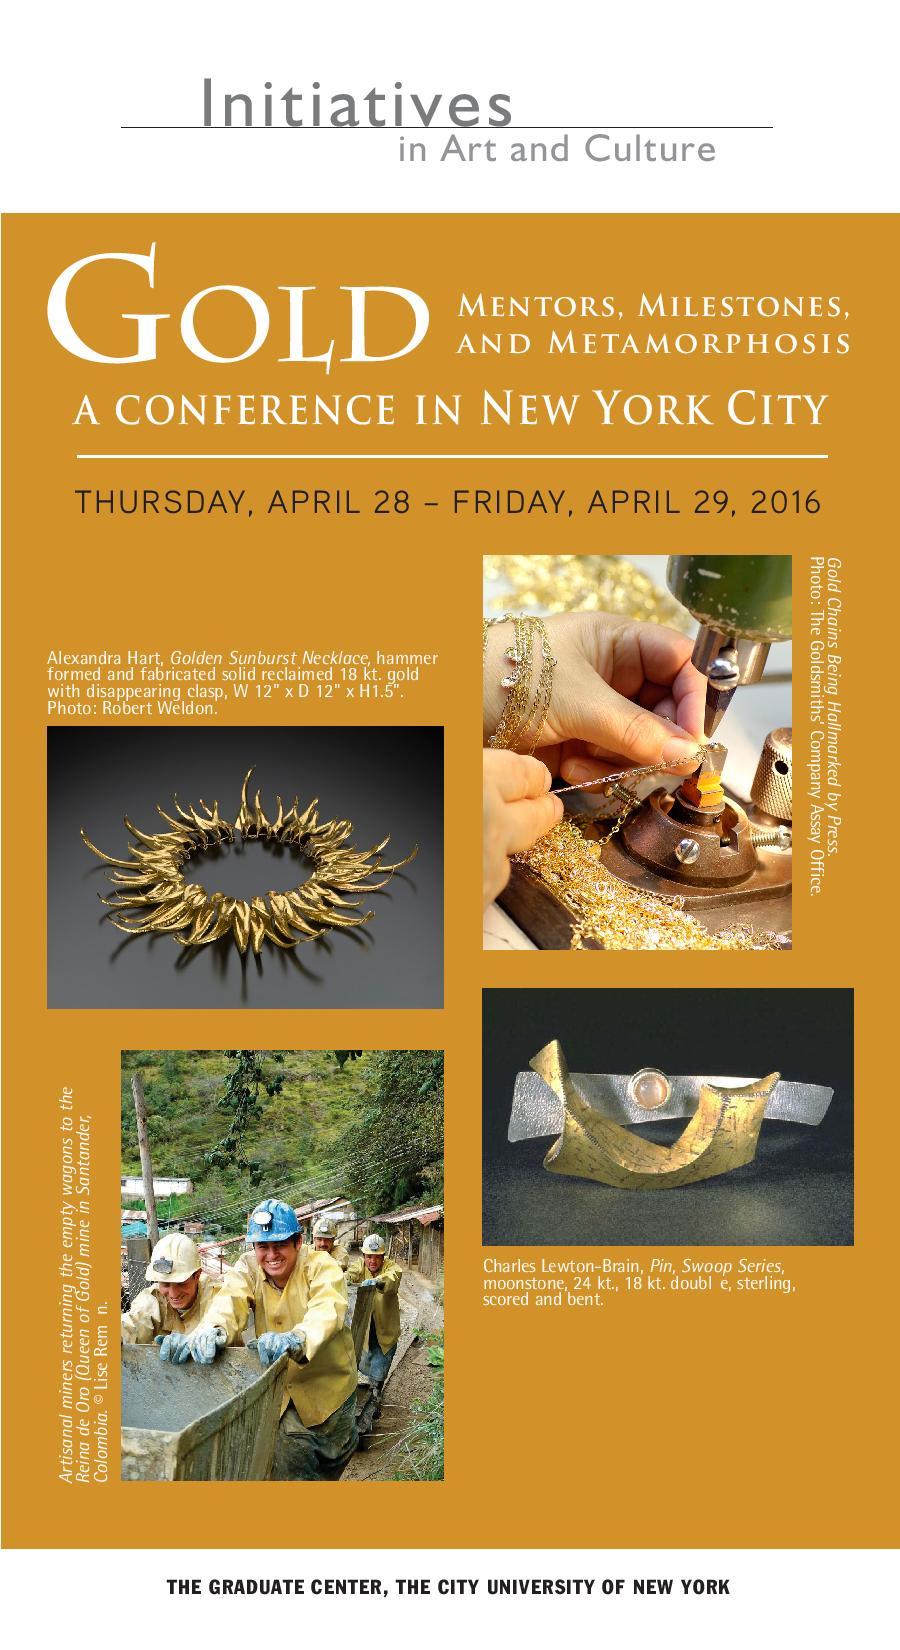 Golden Sunburst on Cover: IAC Conference